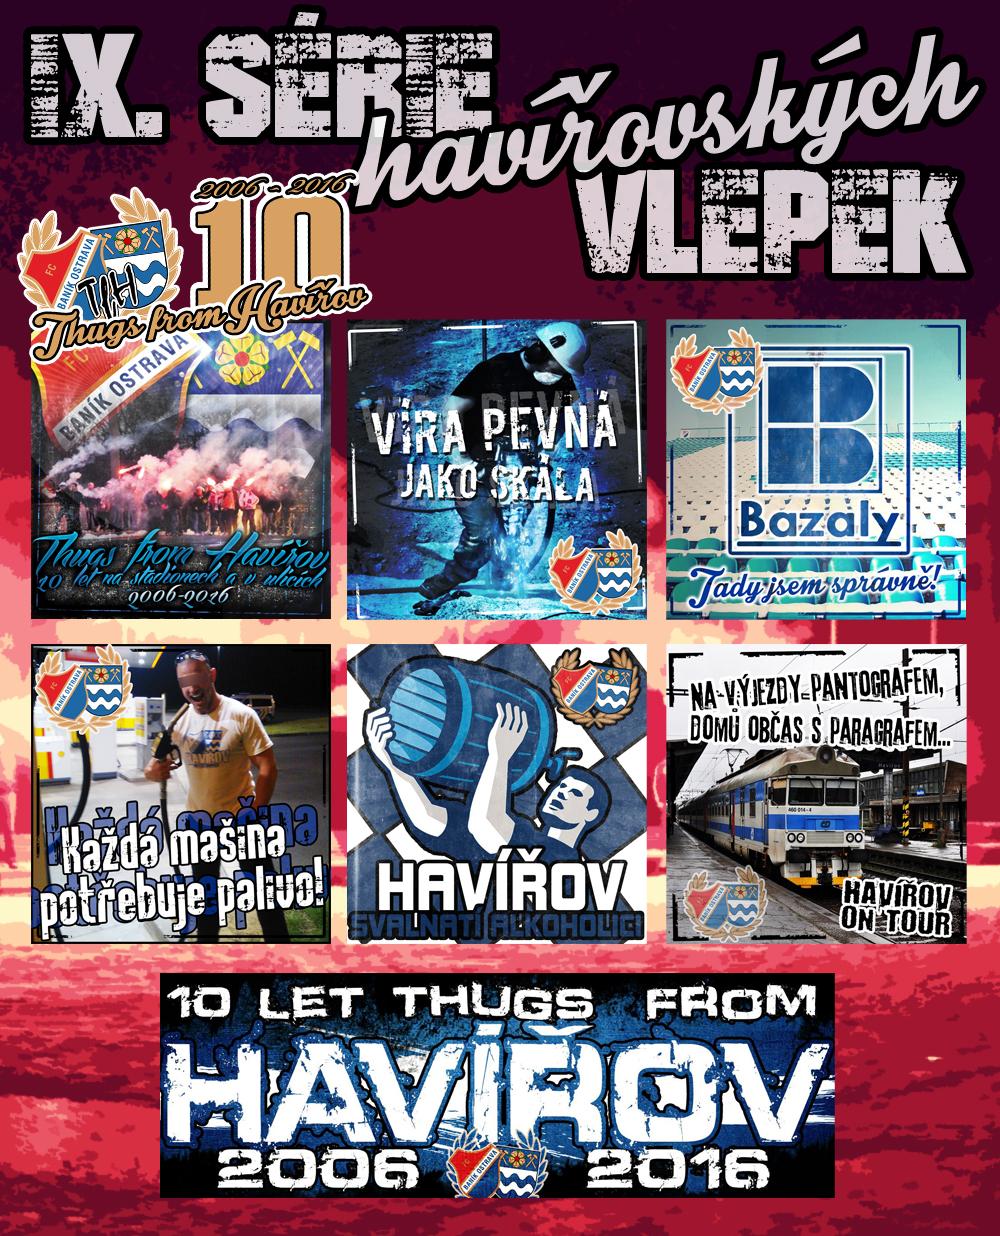 www.havirovaci.cz/wp-content/gallery/vlepy/IXserie2016_2_web.jpg